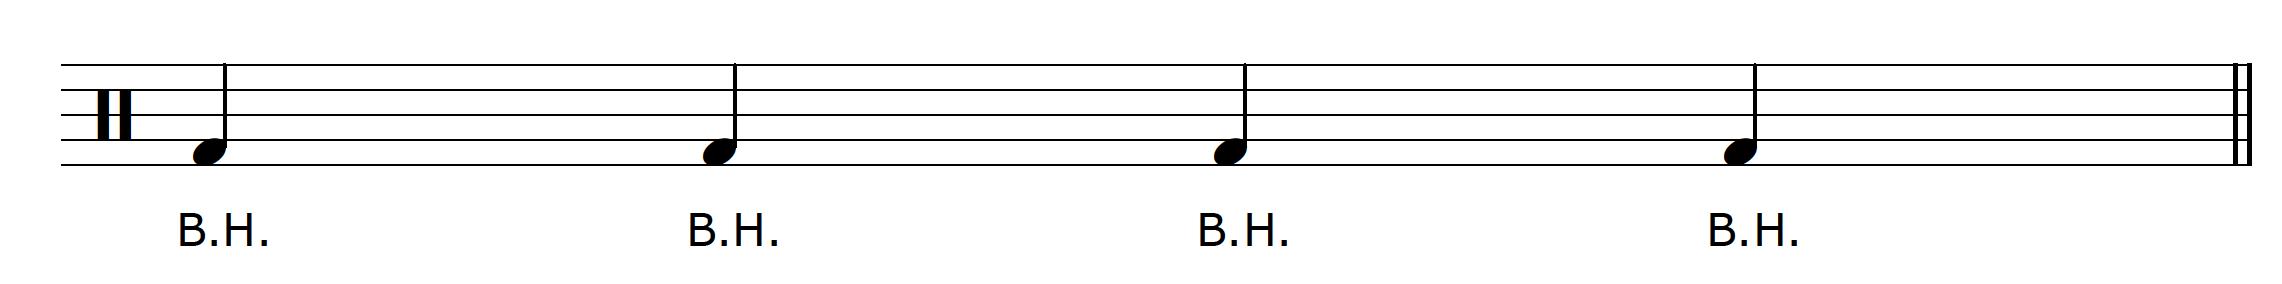 Percussive Guitar Technique Kick Drum